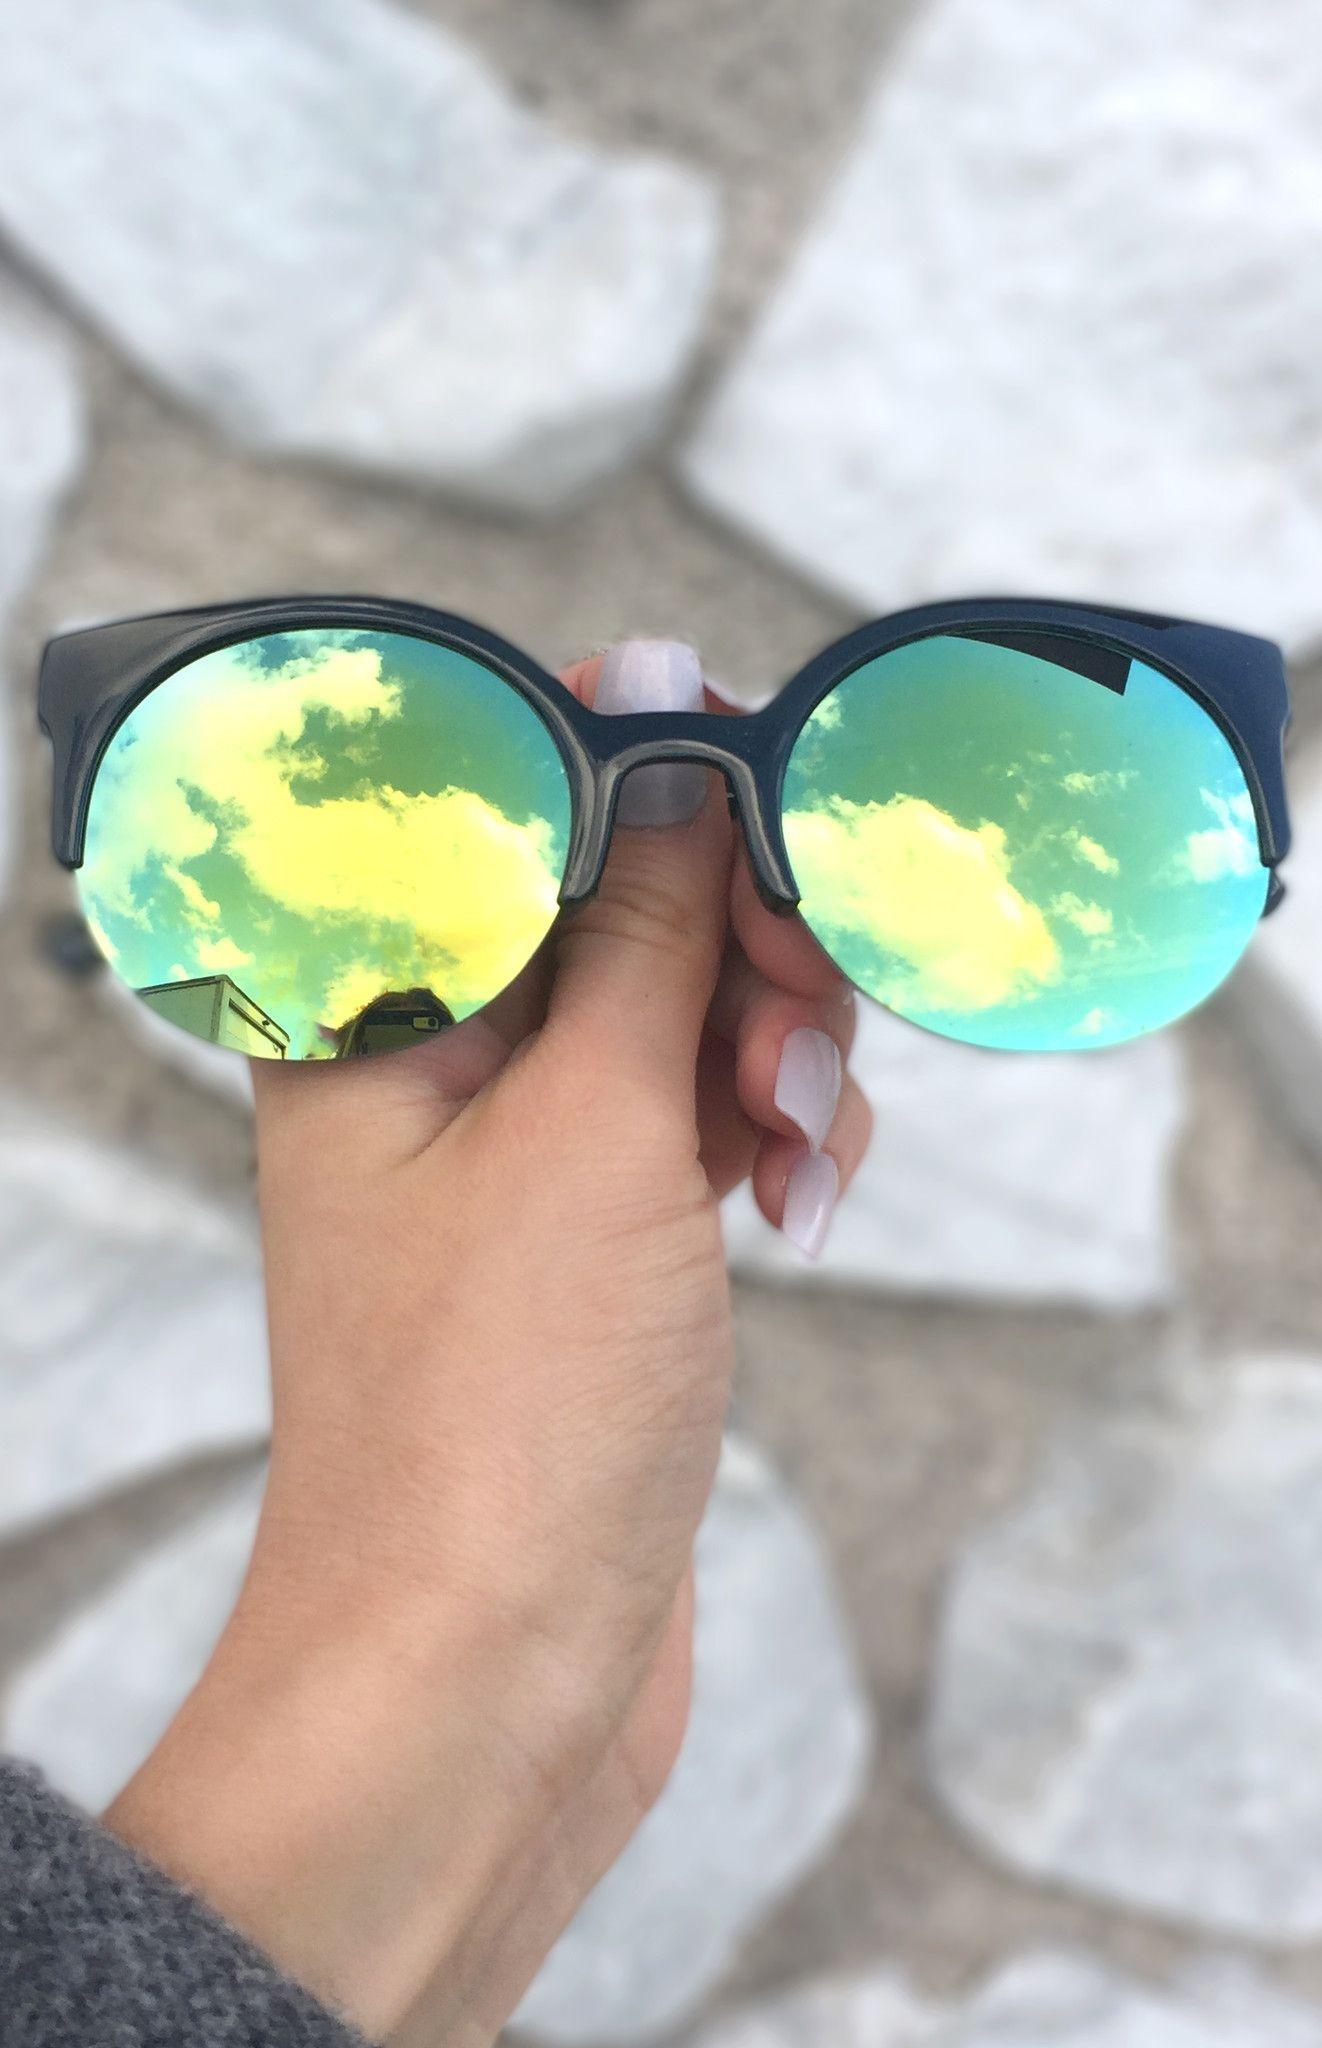 eff217cc7 Retro round Sunnies - Black/ Green + Yellow (featuring transforming lens)